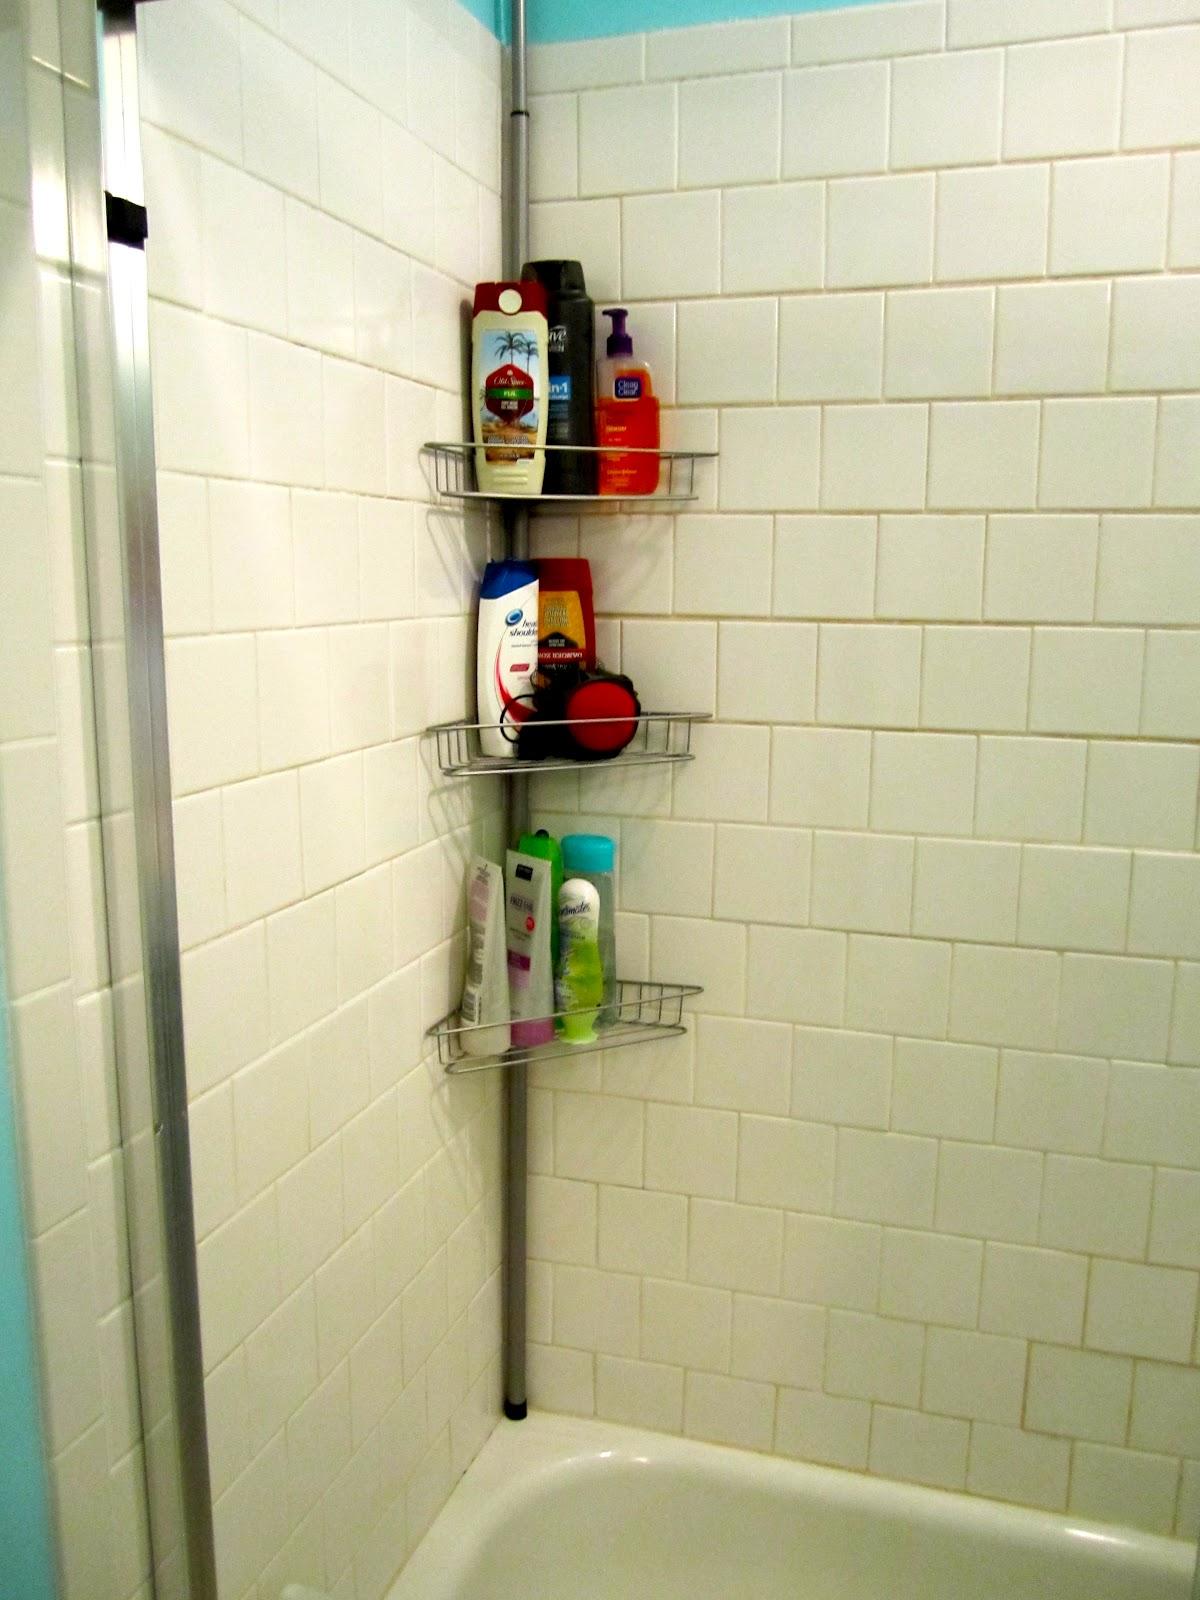 Blairsunderland Blogs Organizing A Cluttered Bathroom